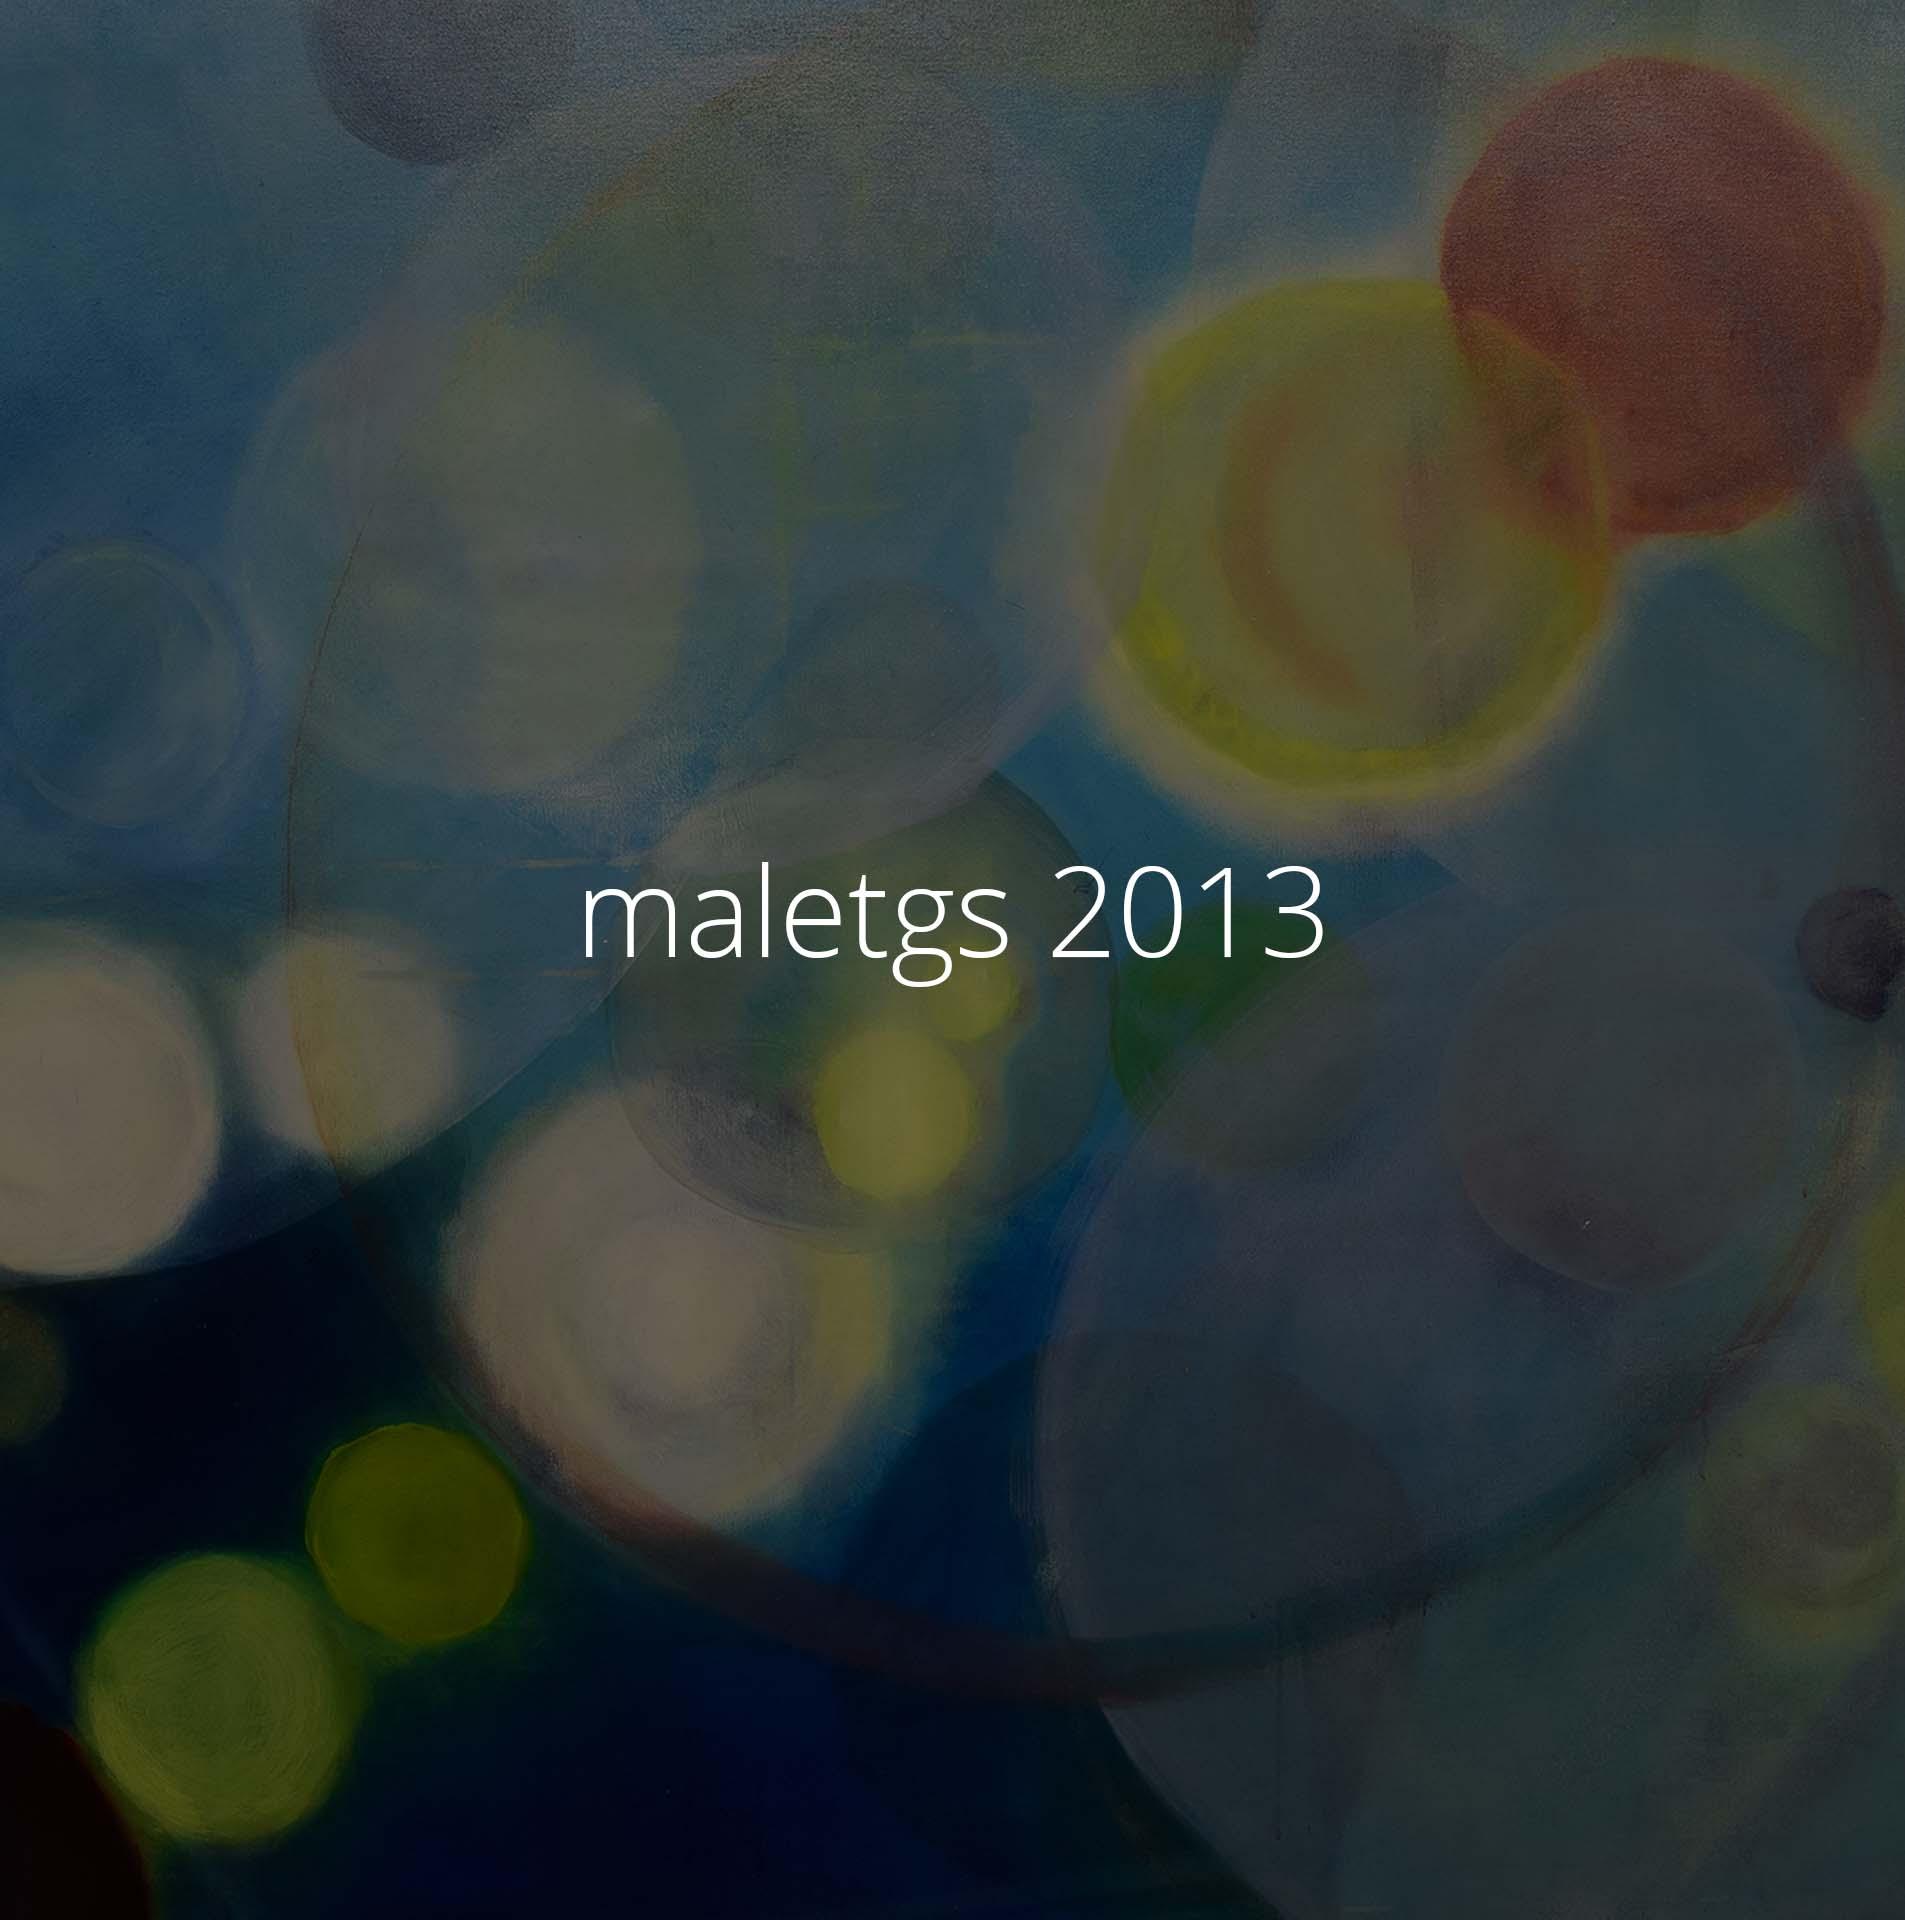 maletgs 2013